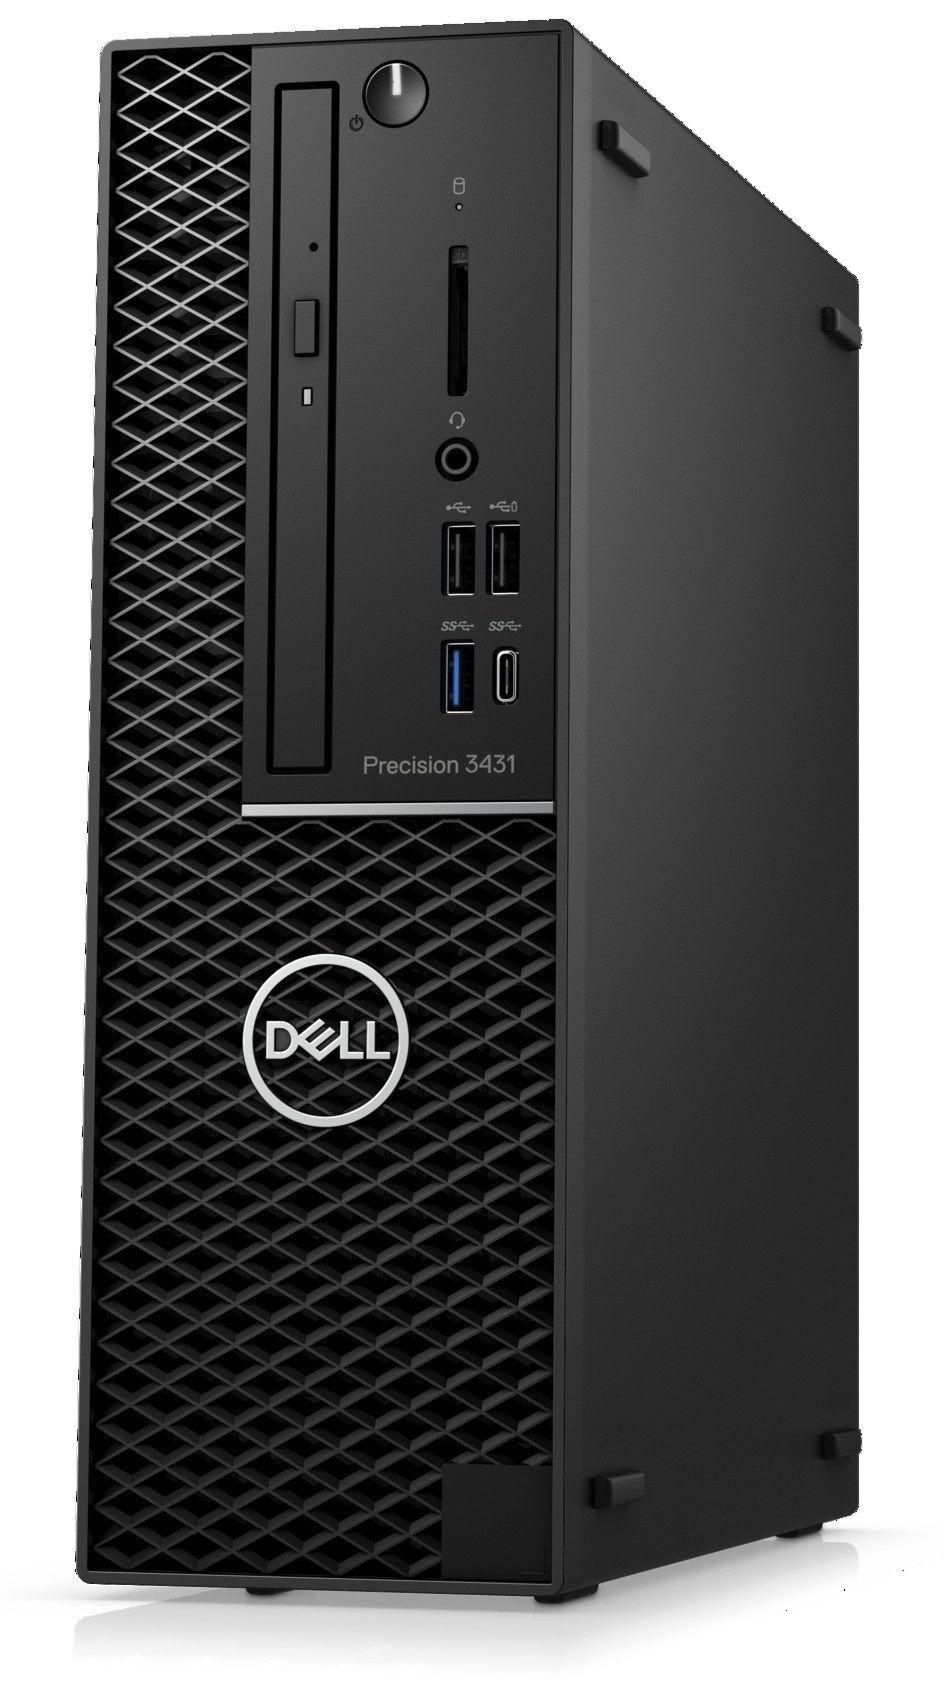 Работна станция Dell Precision - 3431 SFF, черен - 4